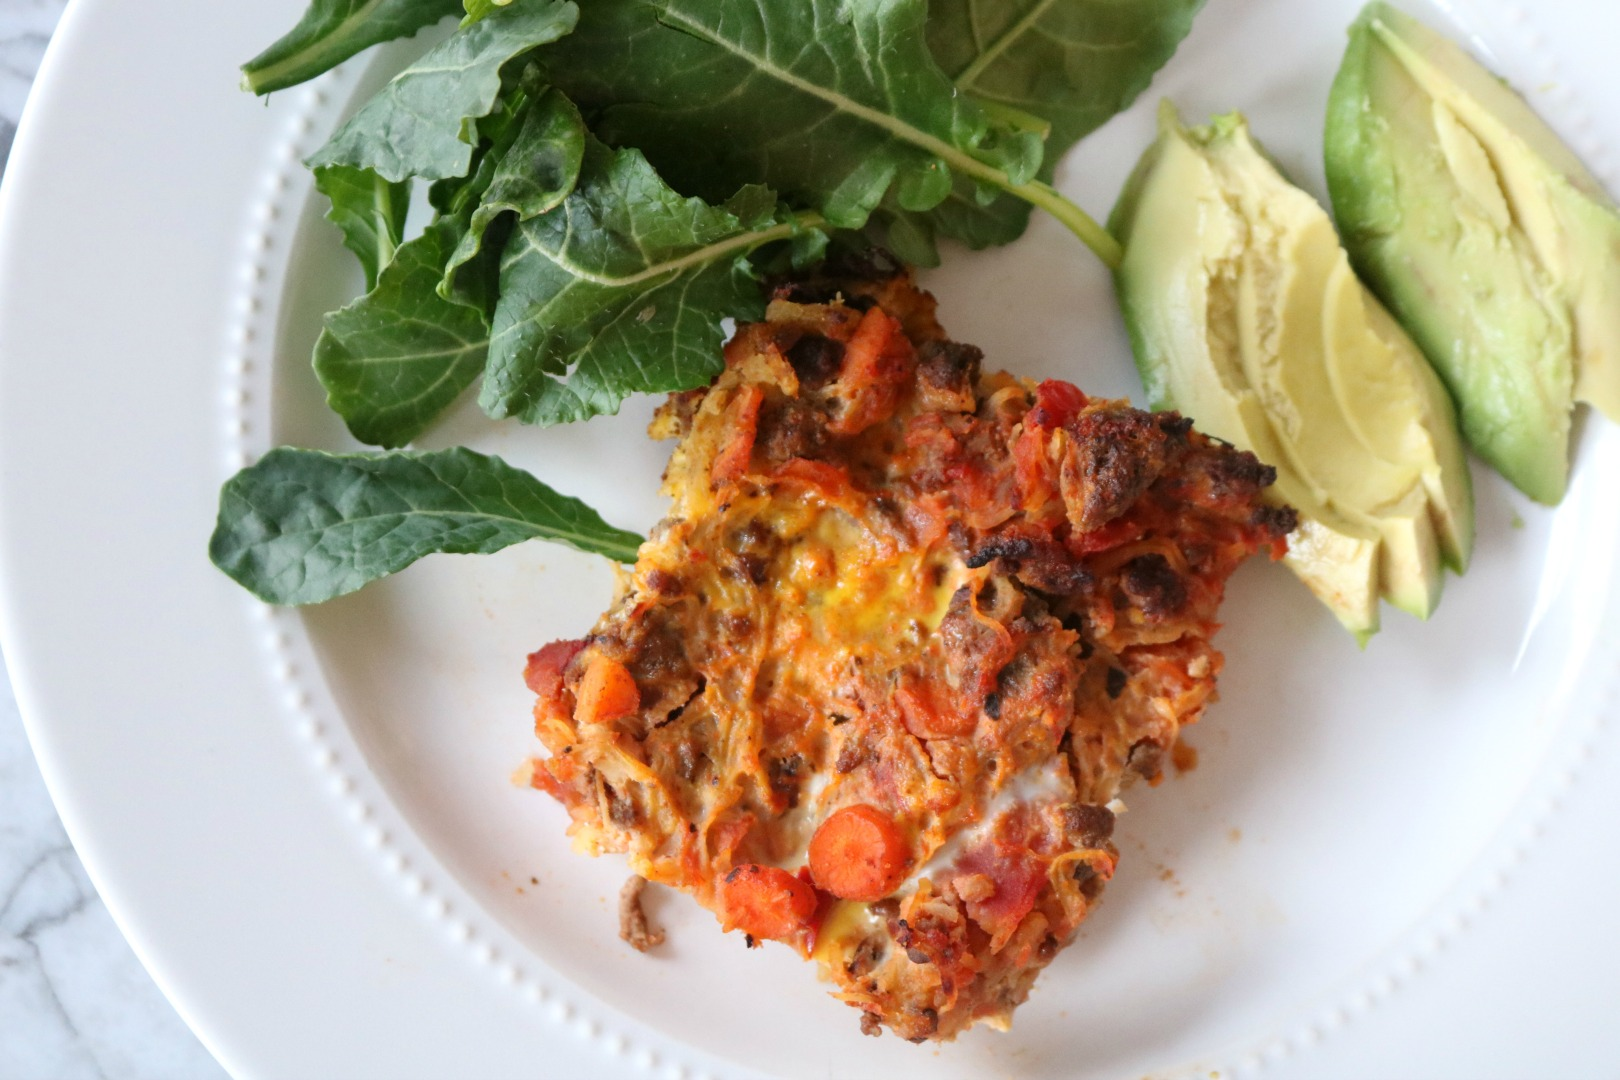 Quick and Healthy Dinner- Spaghetti Squash Mexican Casserole